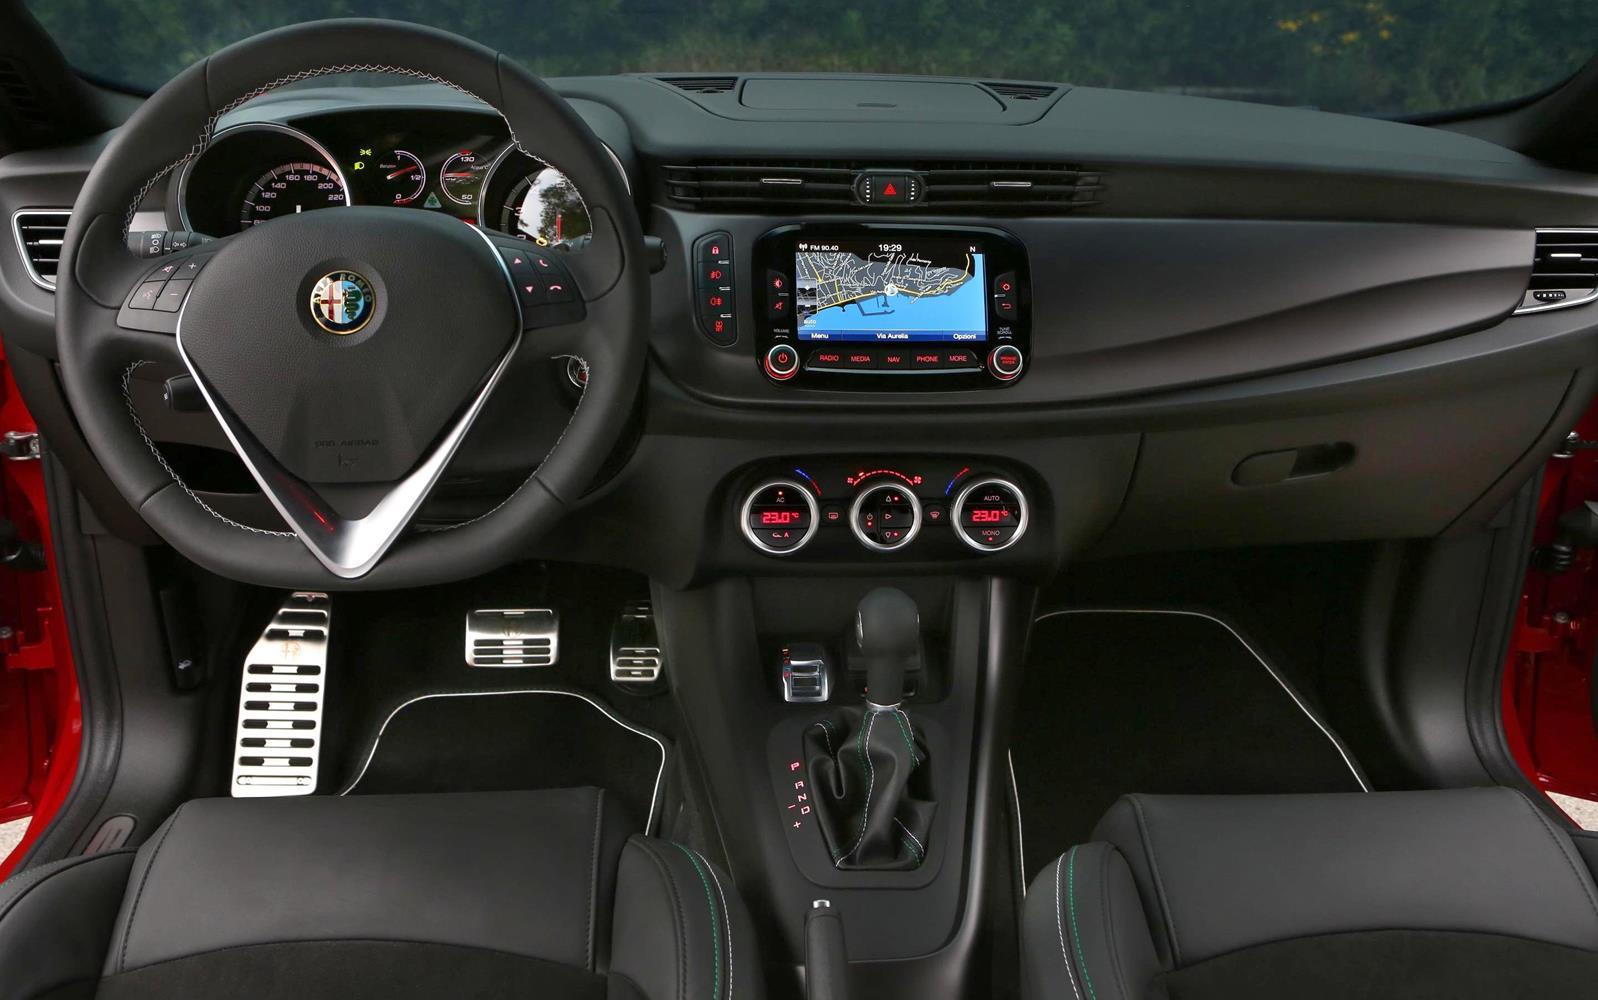 Alfa Romeo Giulietta Quadrifoglio Verde 2014 Dashboard